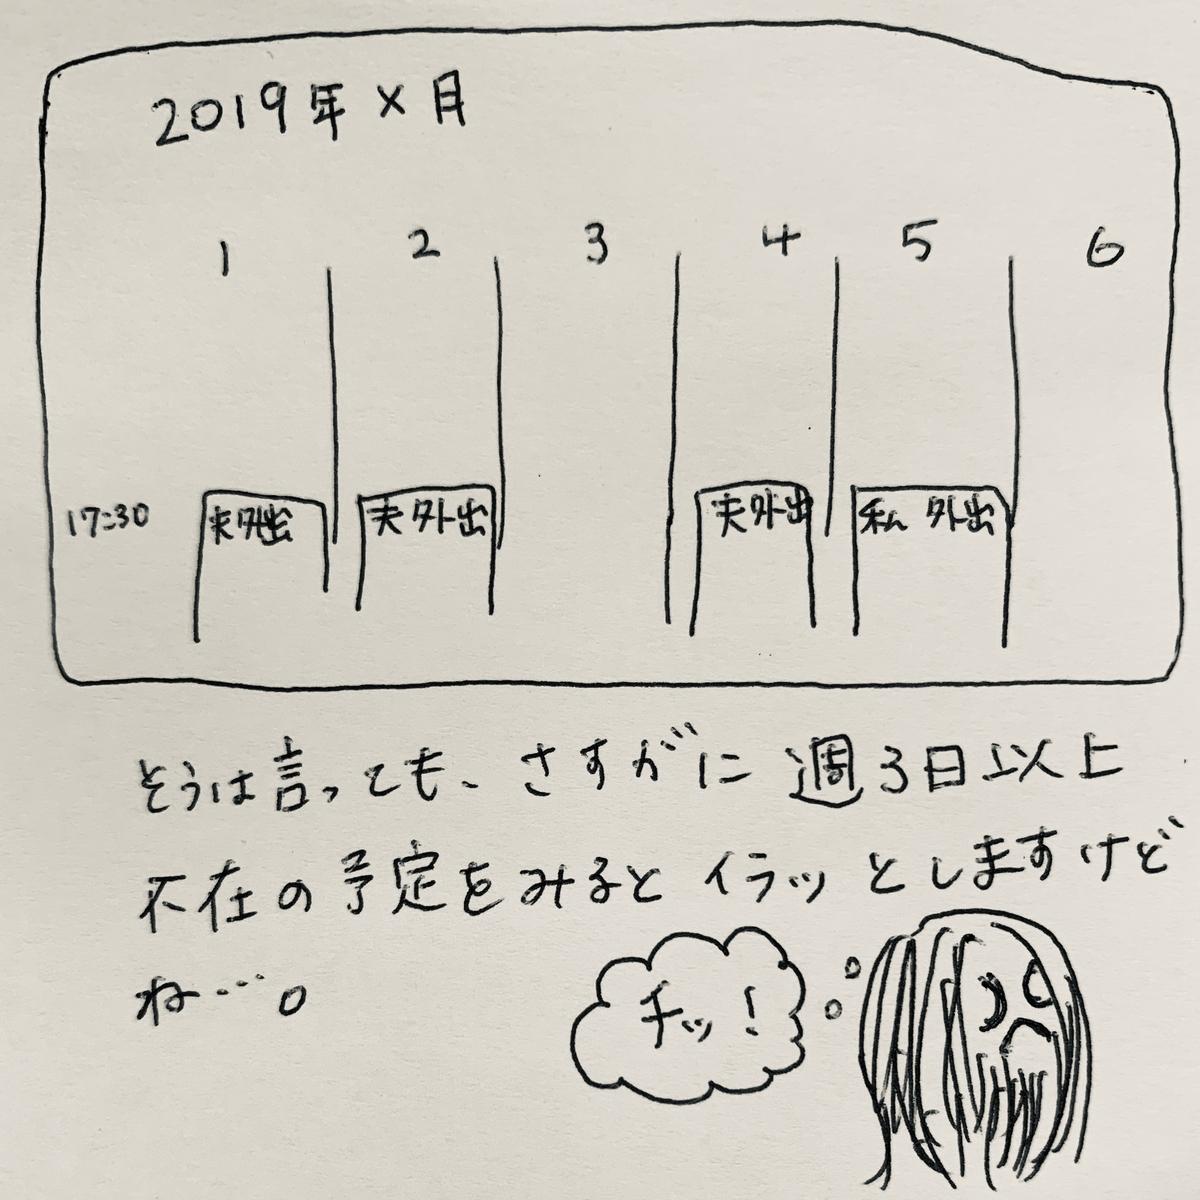 f:id:nananan0:20190628133808j:plain